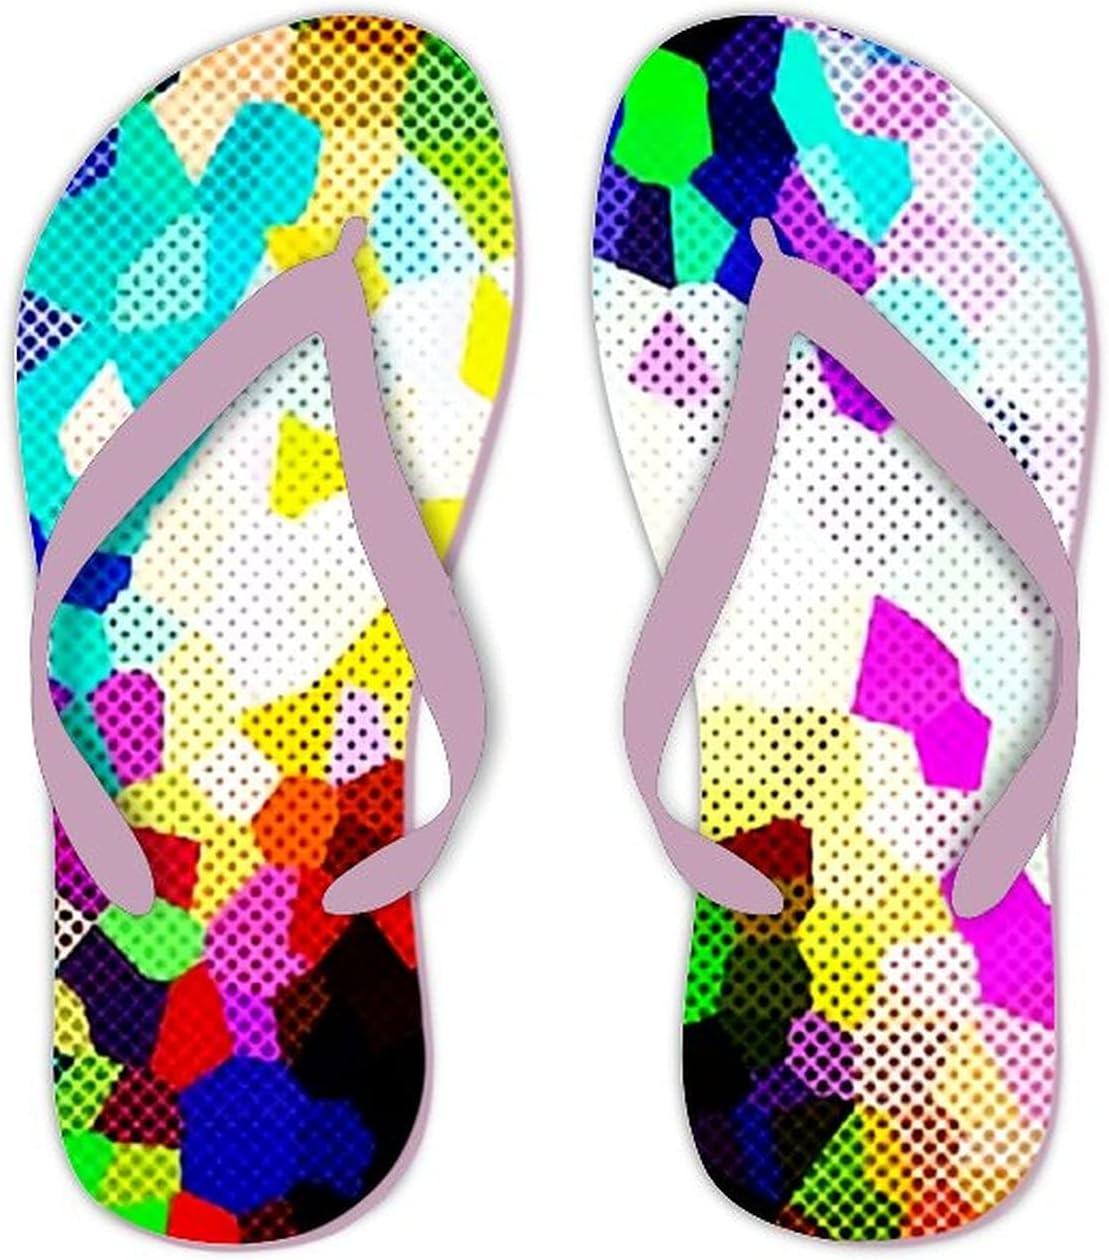 UTF4C Summer Flip Flops for Men Women Abstract Multicolor Color Background crystallise Soft Lightweight Non Slip Sandals for Shower Beach Pool Bathroom Flat 7.5